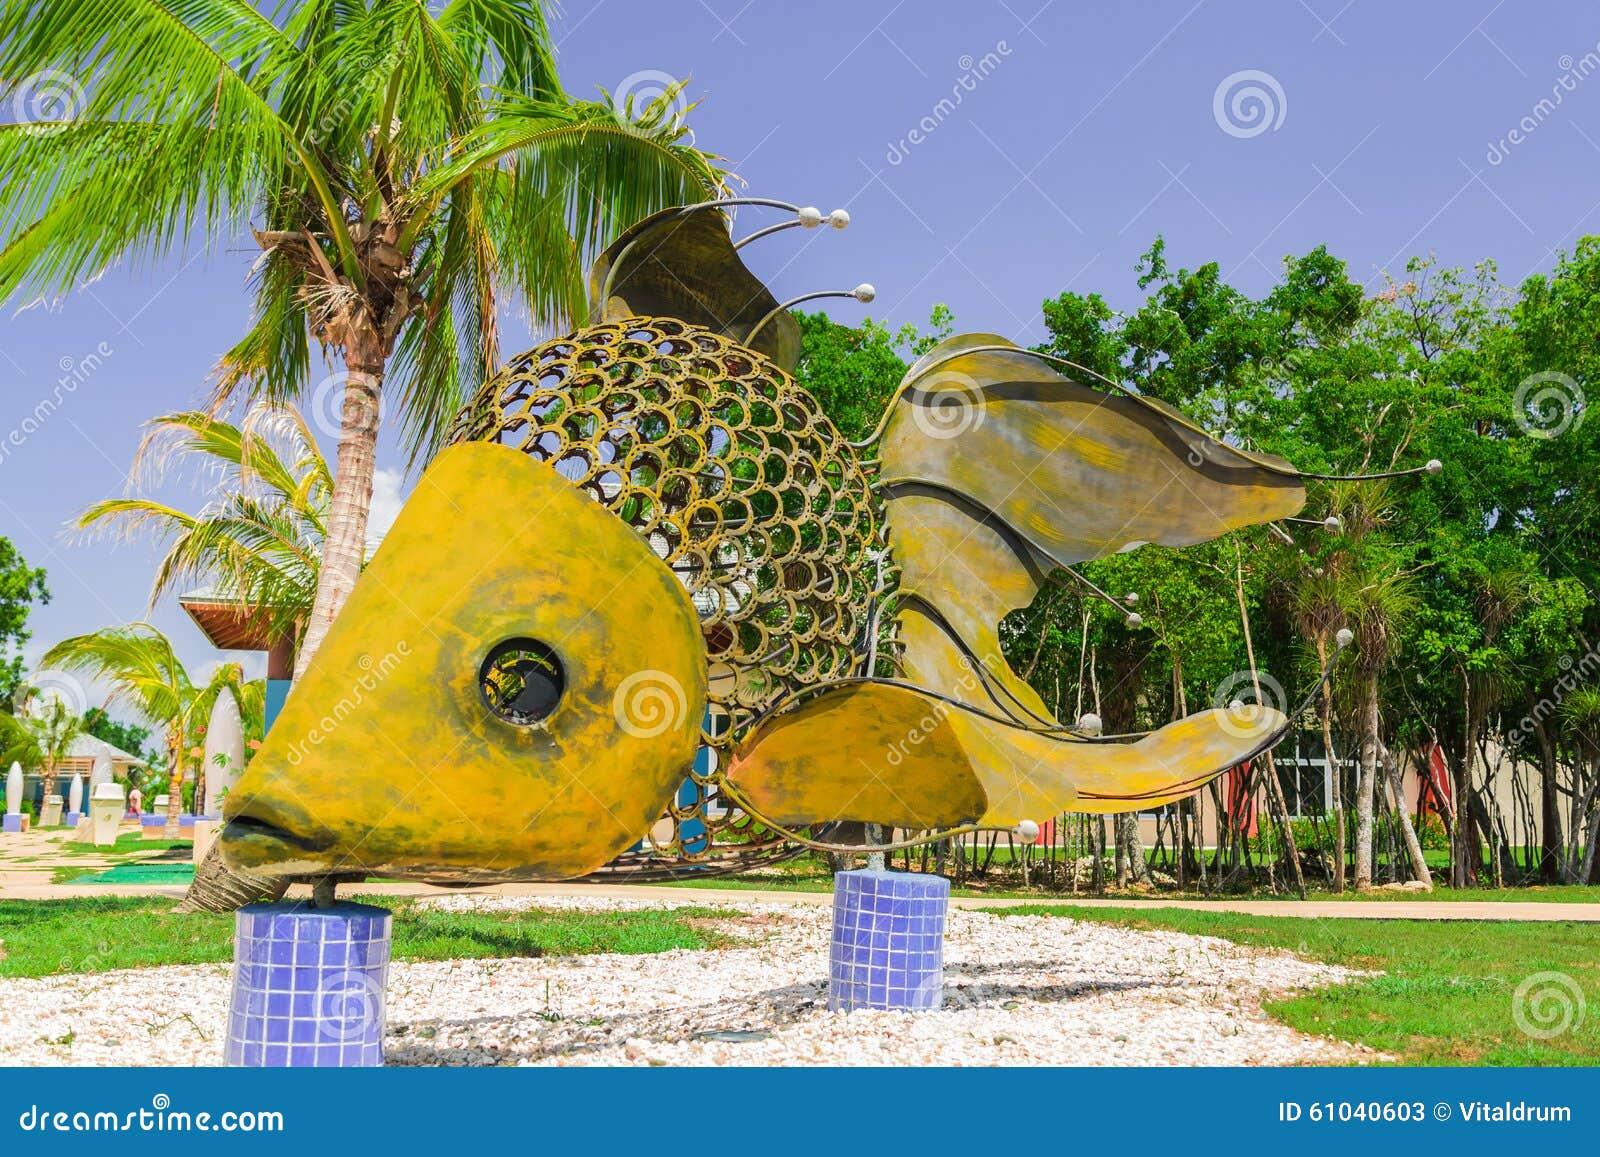 giant big, decorative beutiful fish made of metal and horshoe